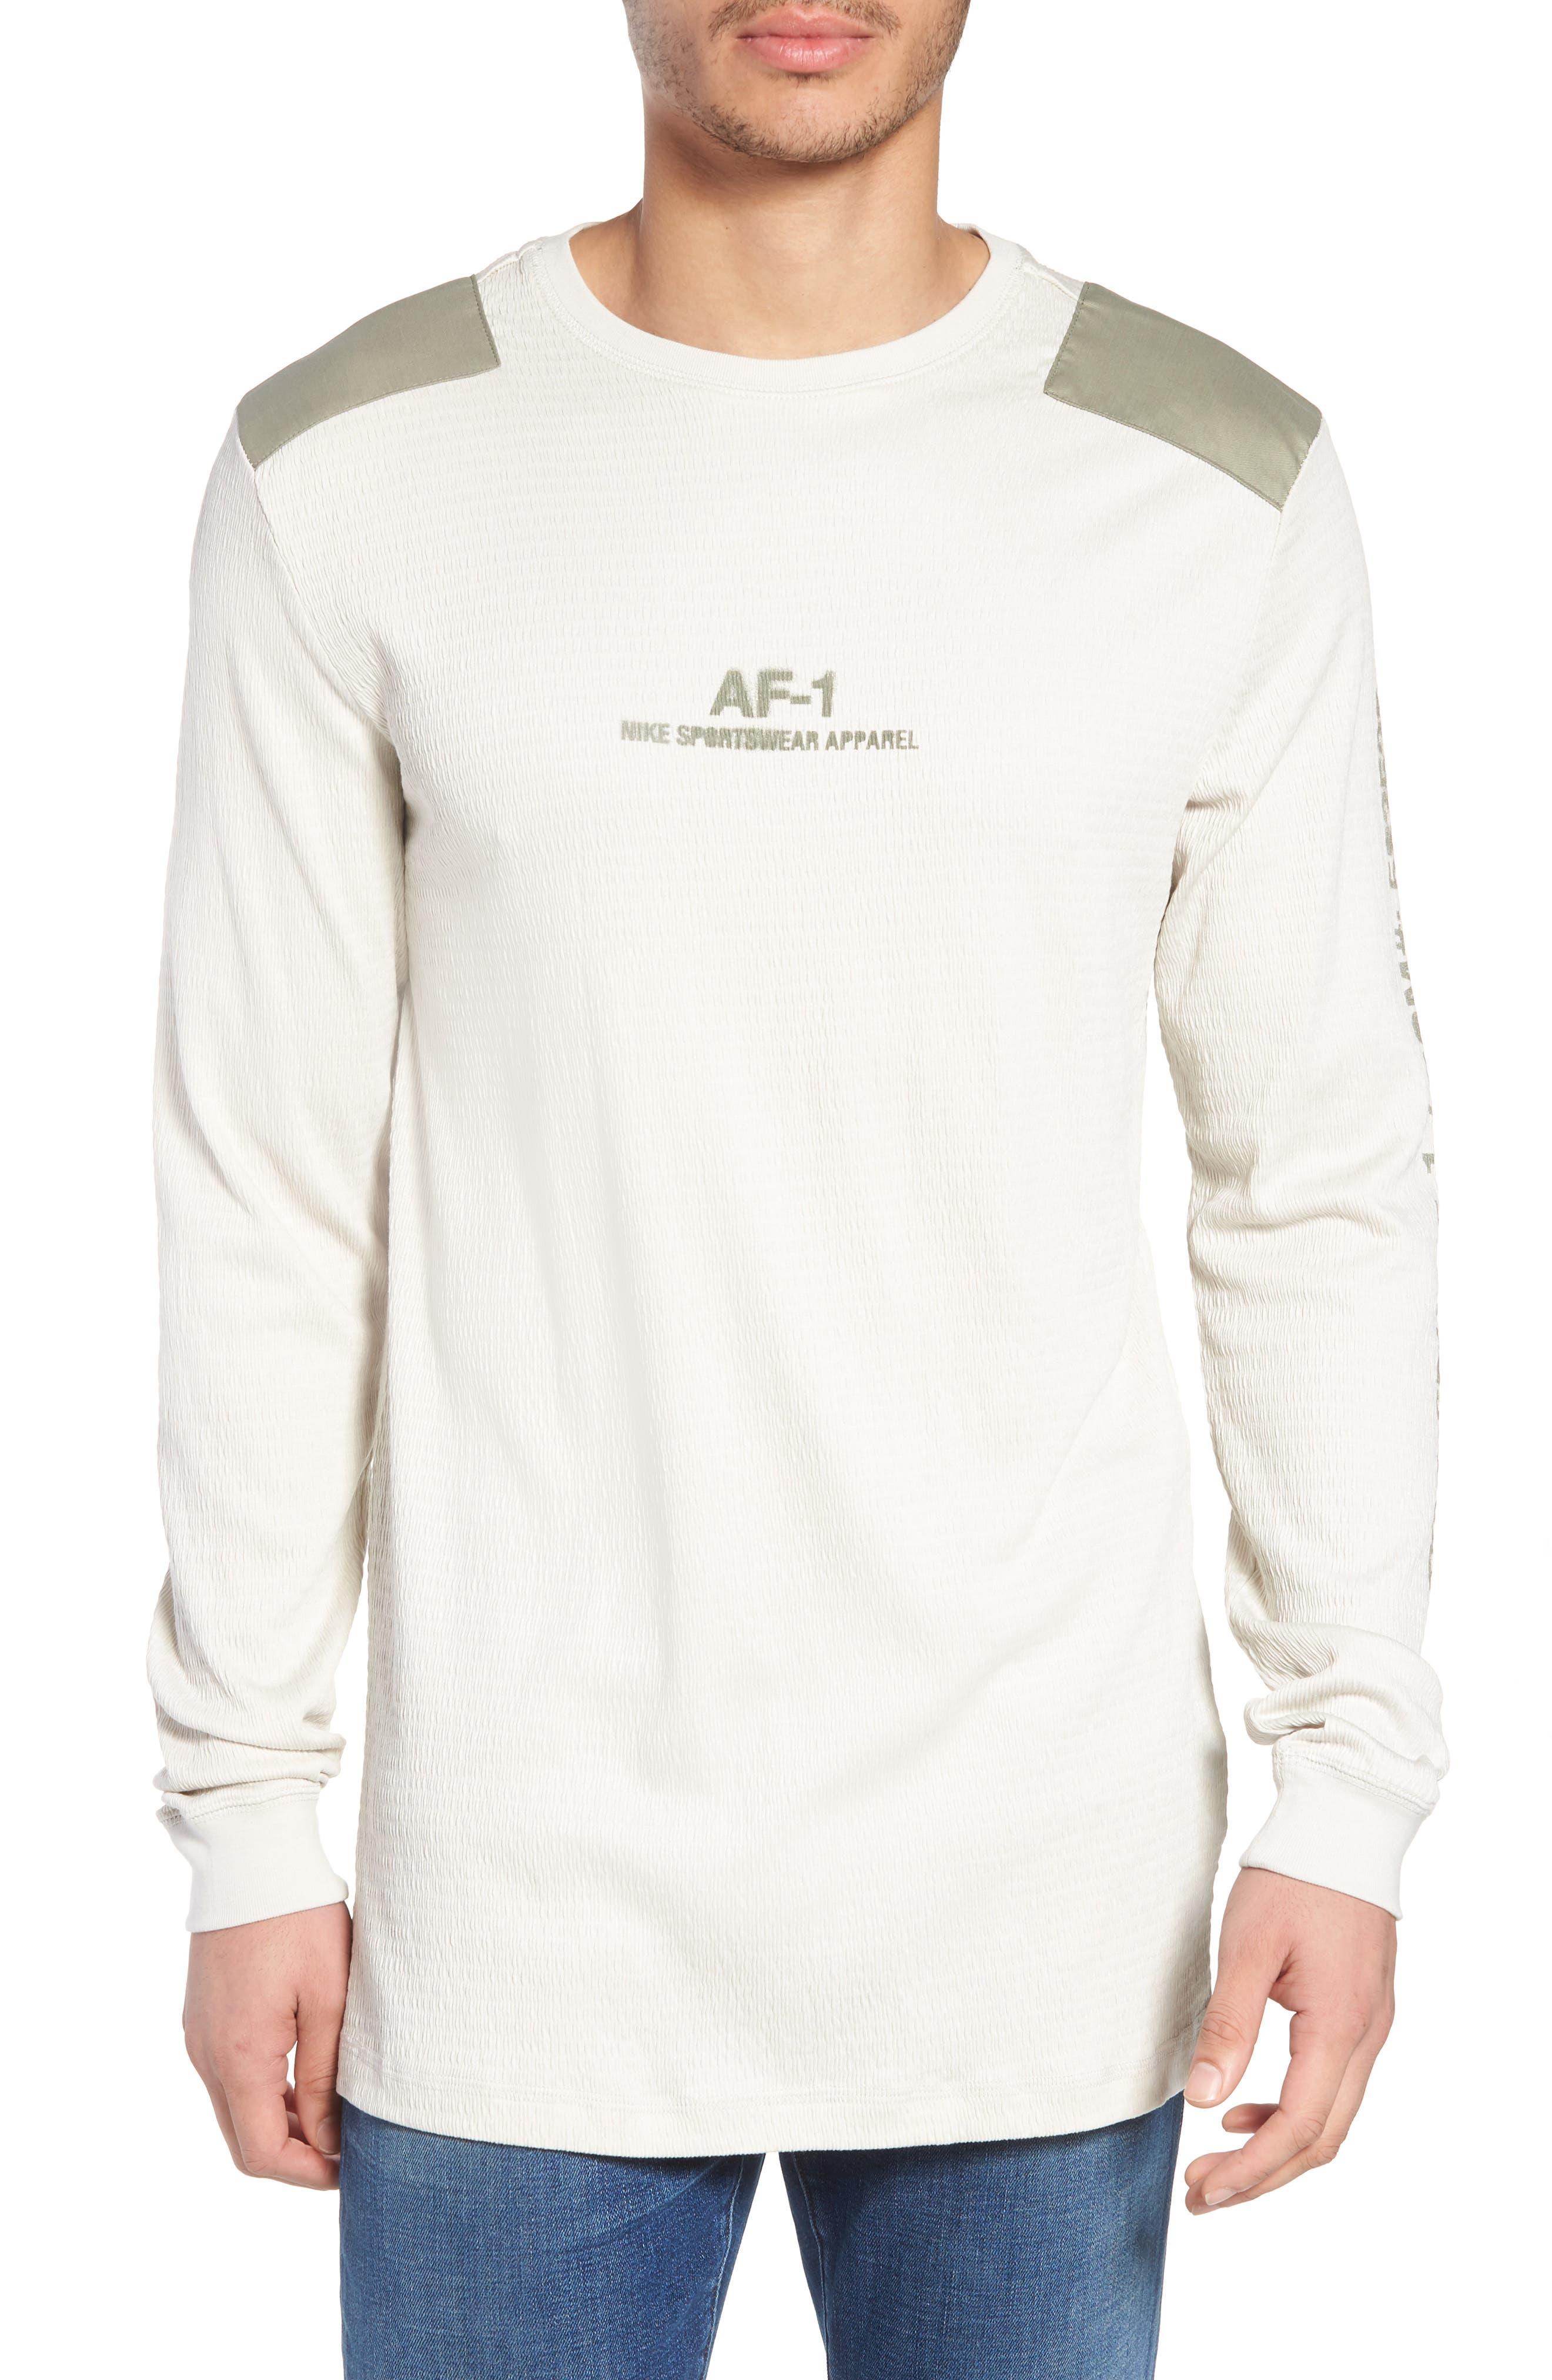 Sportswear AF-1 Long Sleeve Shirt,                             Main thumbnail 1, color,                             Light Bone/ Stucco/ Stucco